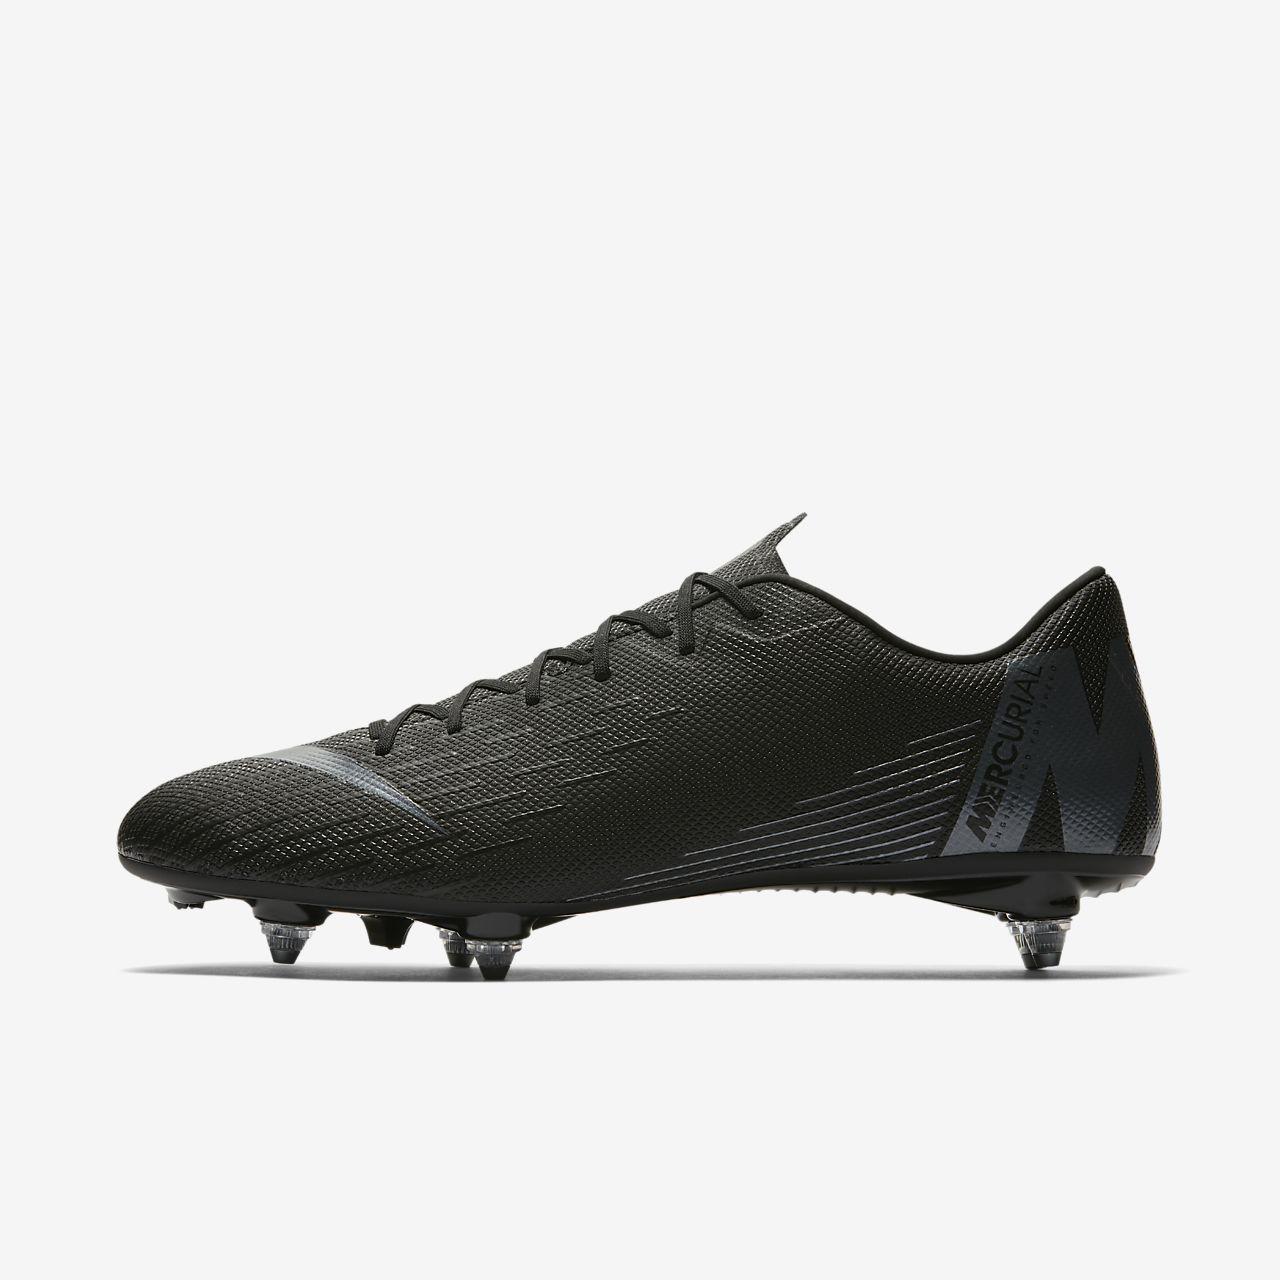 d749d1e22a mercurial-vapor-xii-academy-sg-pro-football-boot-YPTA3Kro.jpg